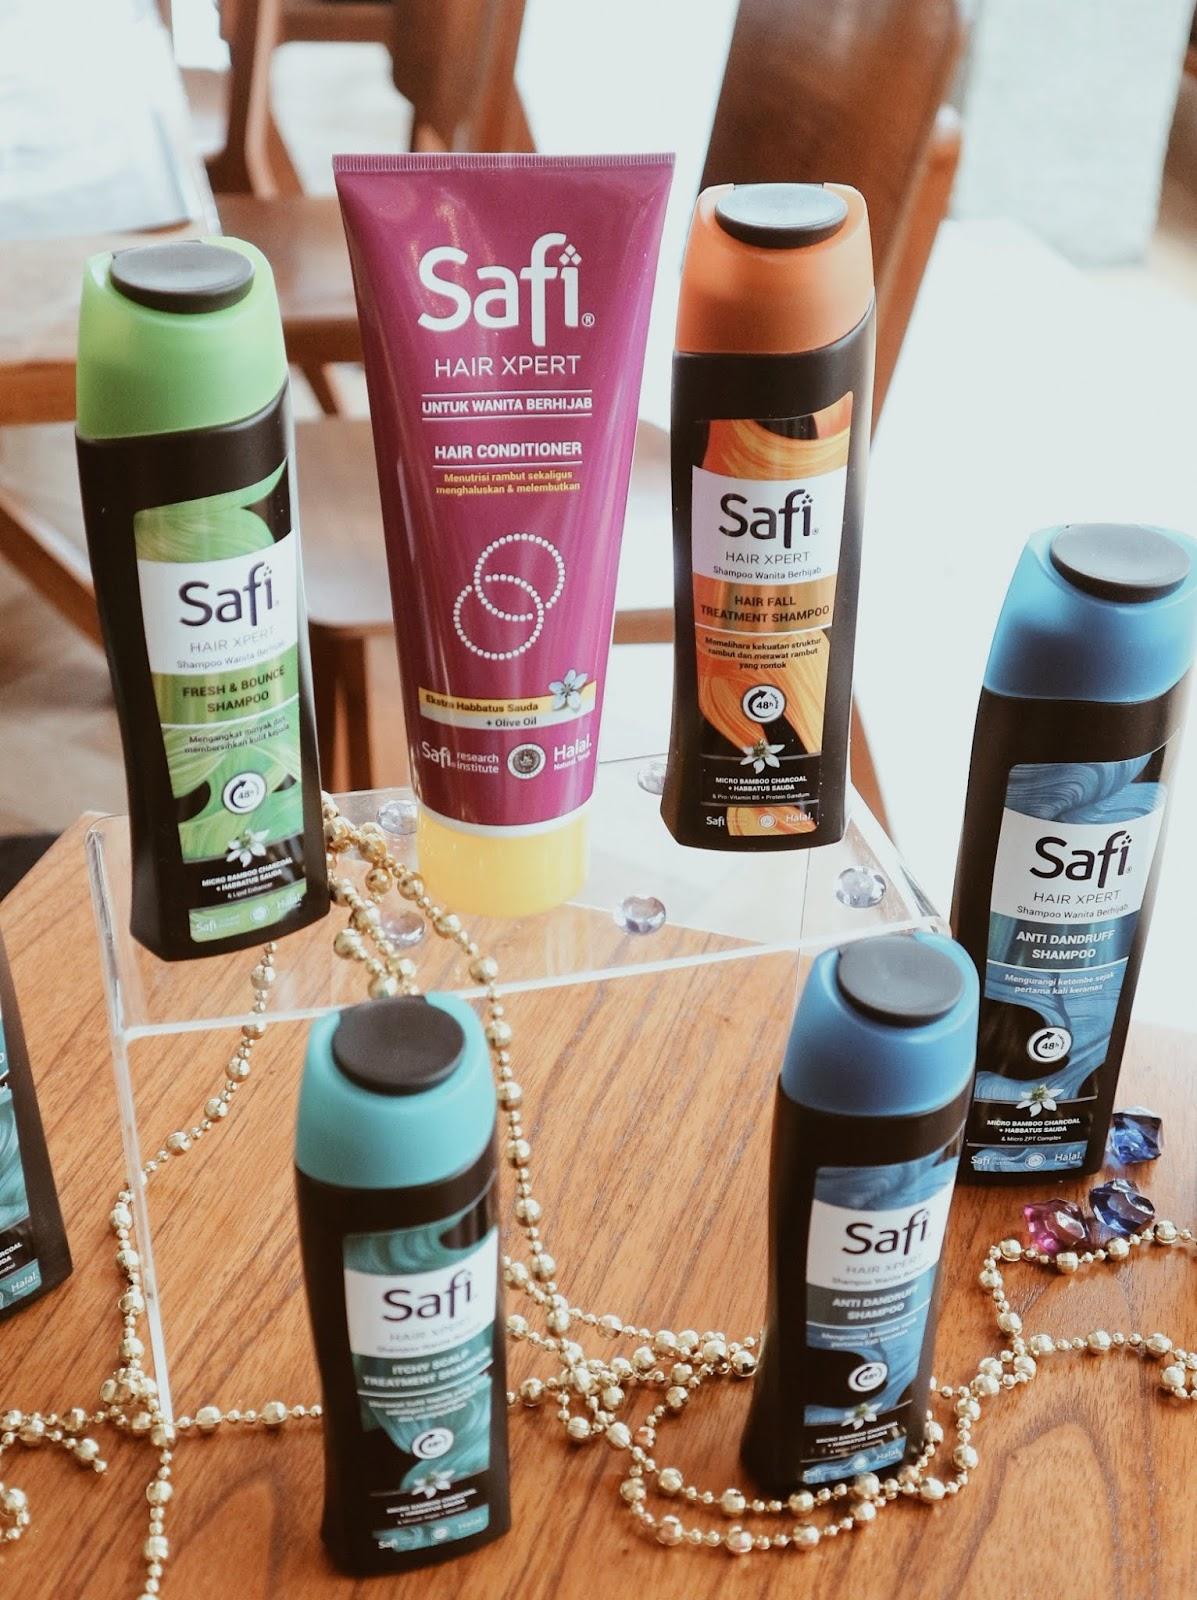 Safi Hair Xpert